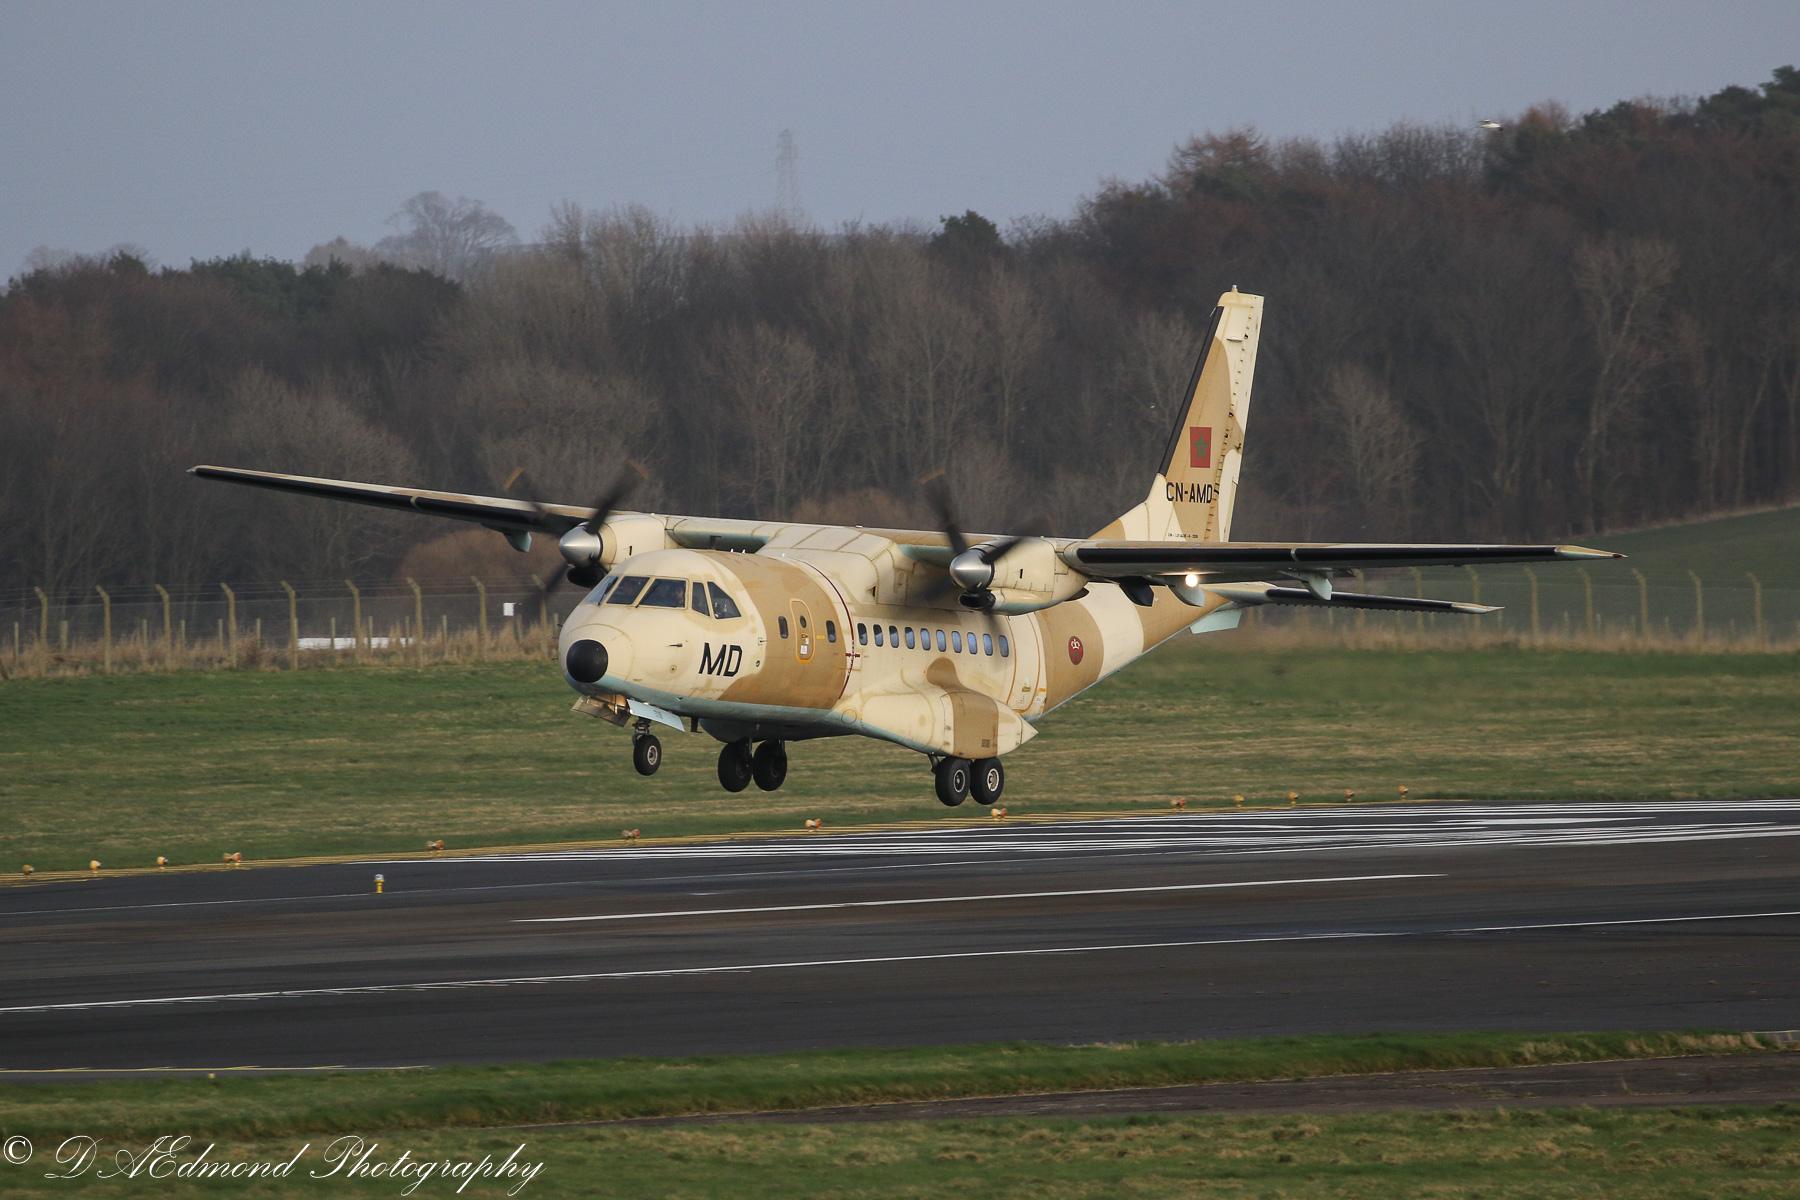 FRA: Photos d'avions de transport - Page 31 33376375695_8c65d27e81_o